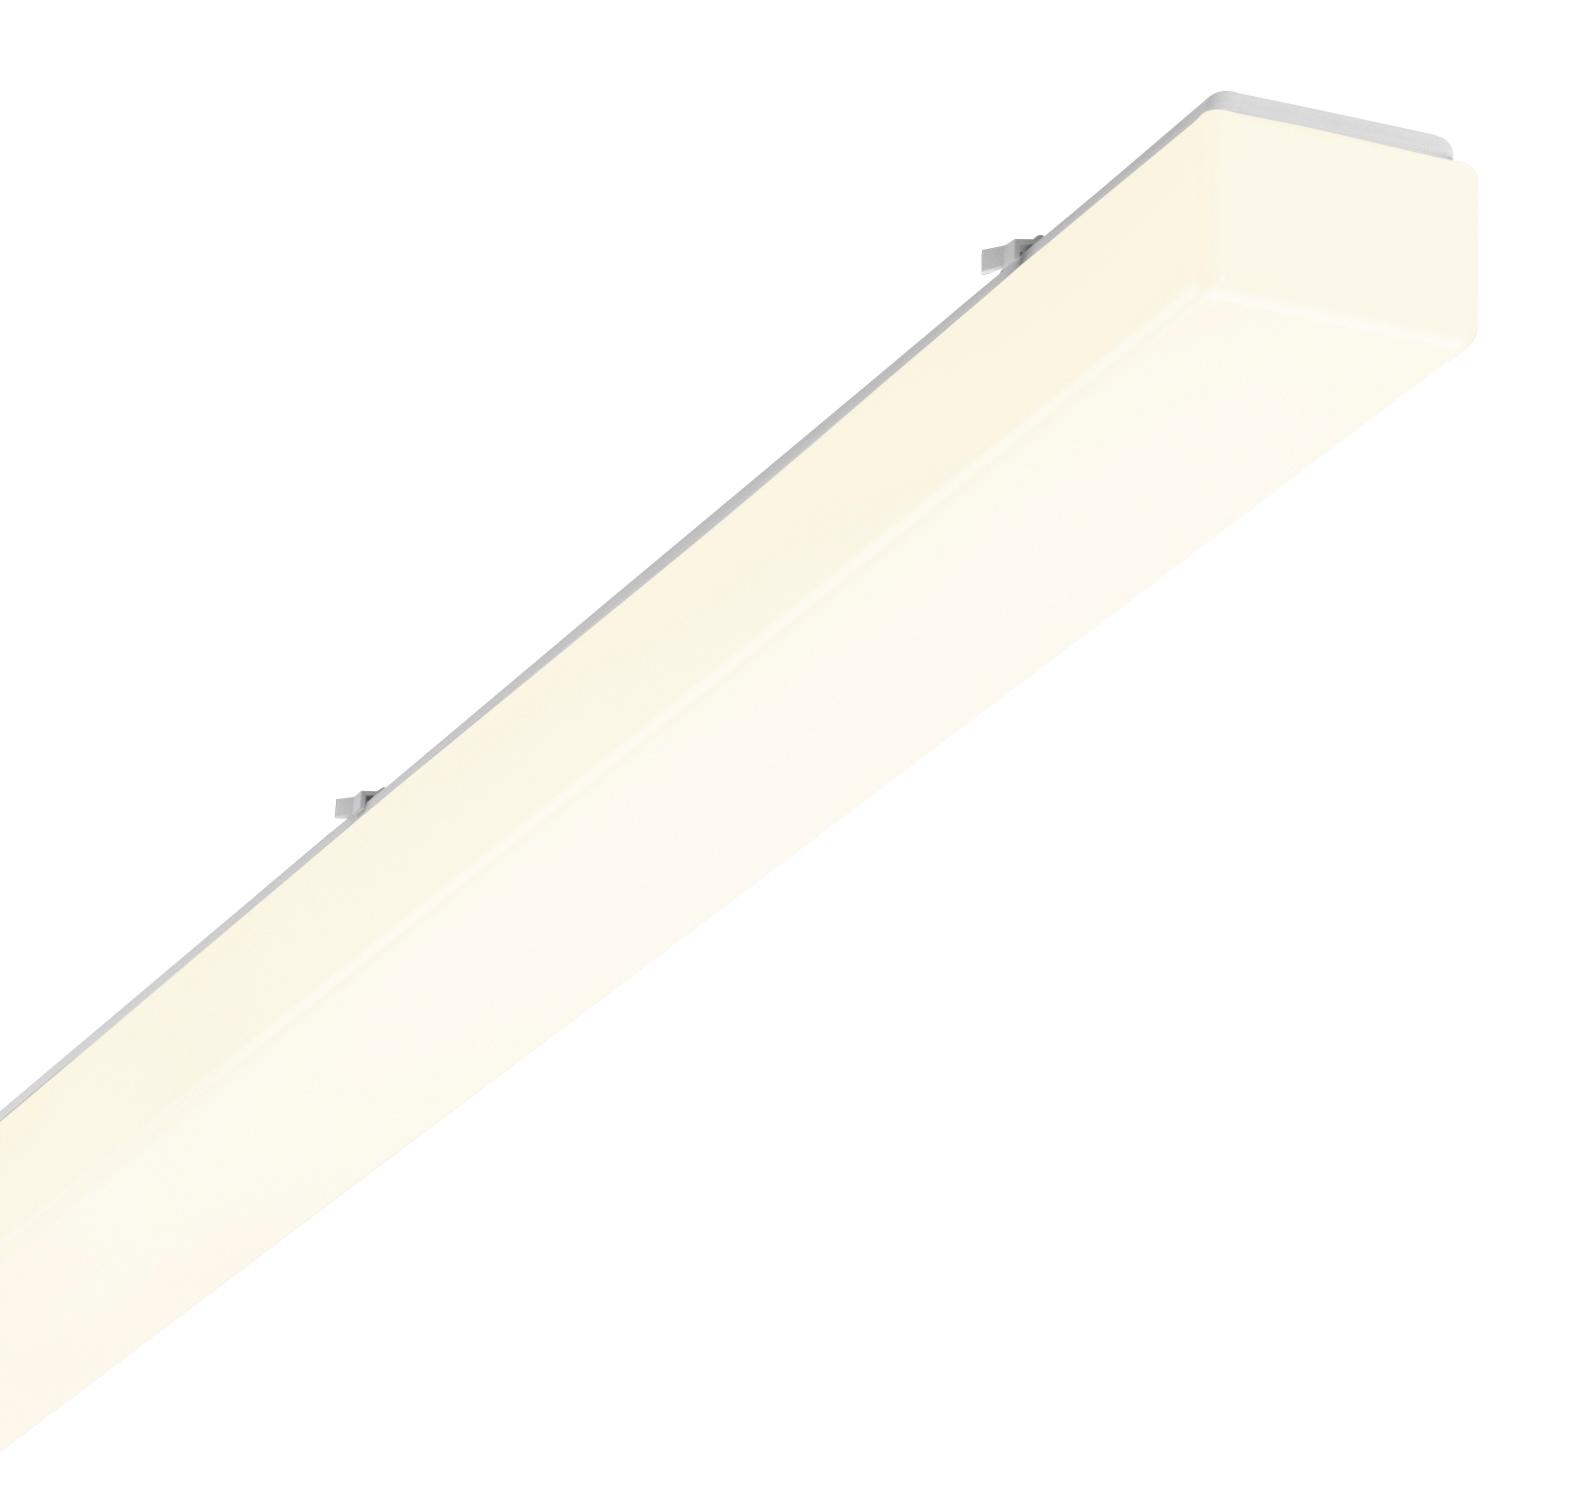 1 Stk AOT-O LED 38W, 3000K, IP50, acryl, opal, weiß, L-1260mm LI70111962